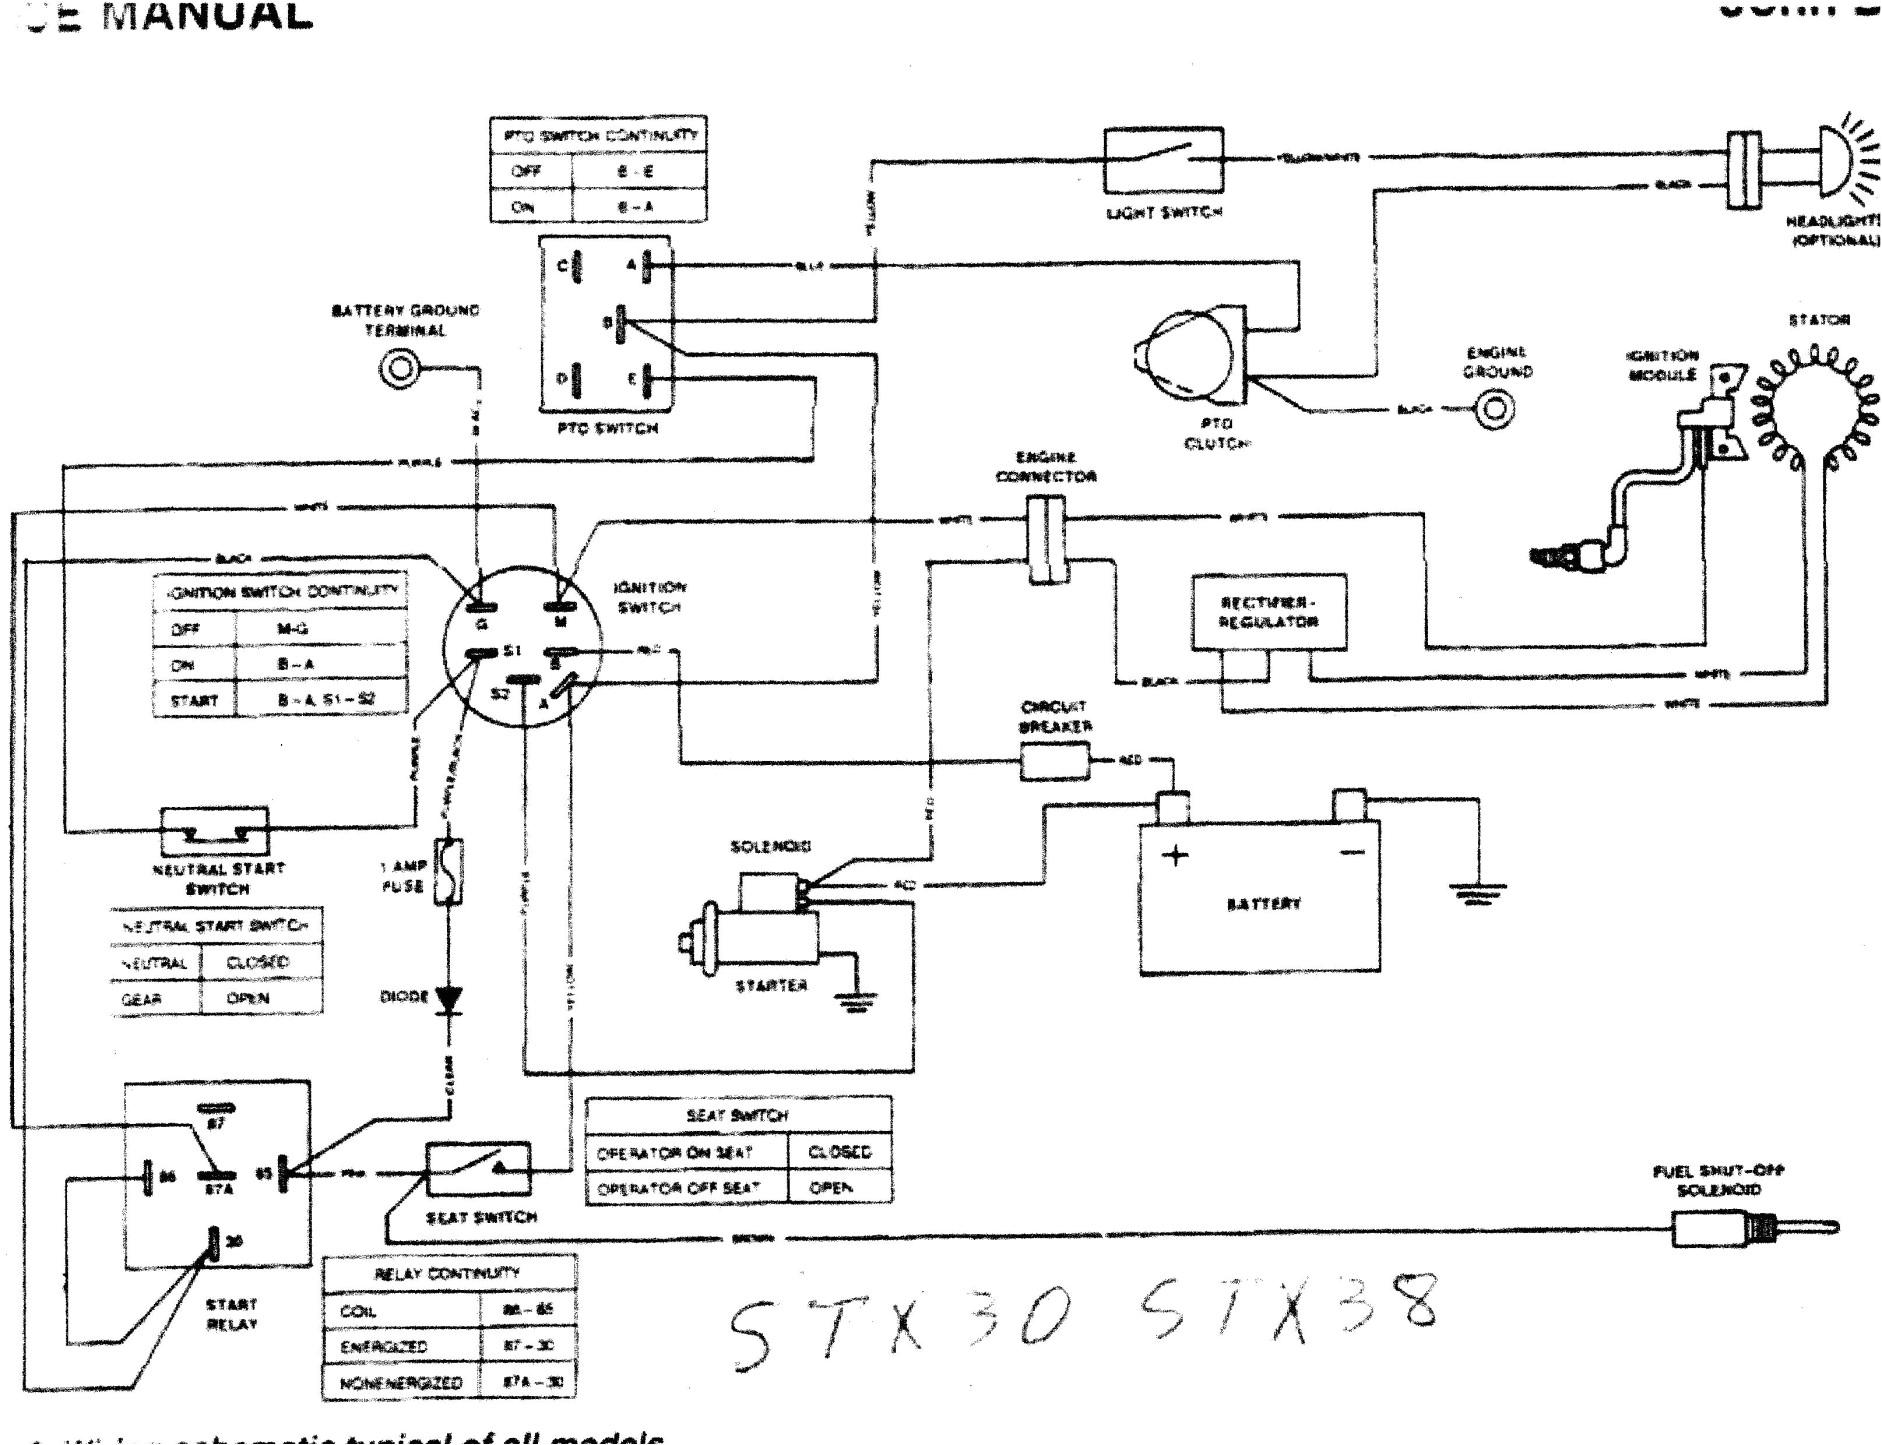 John Deere 445 Wiring Diagram Lx172 Wiring Diagram Wiring Diagram Article Review